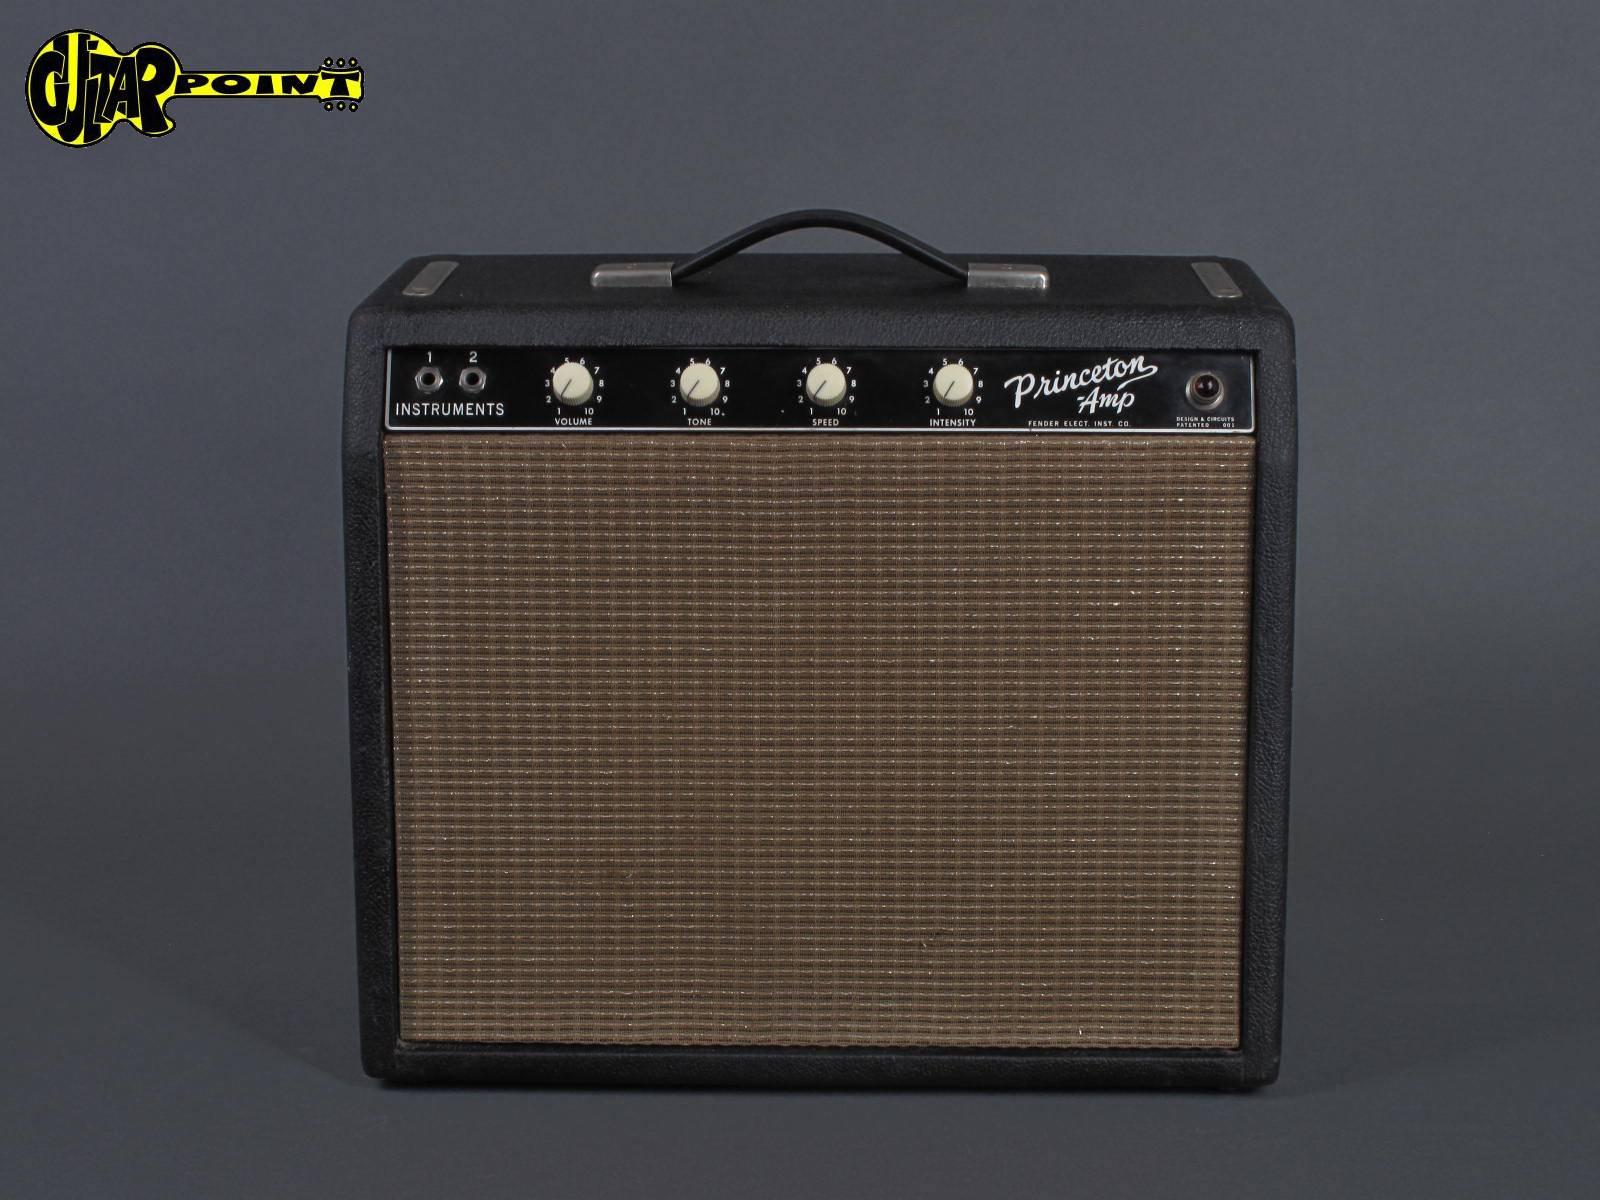 1964 Fender Princeton Amp - Blackface